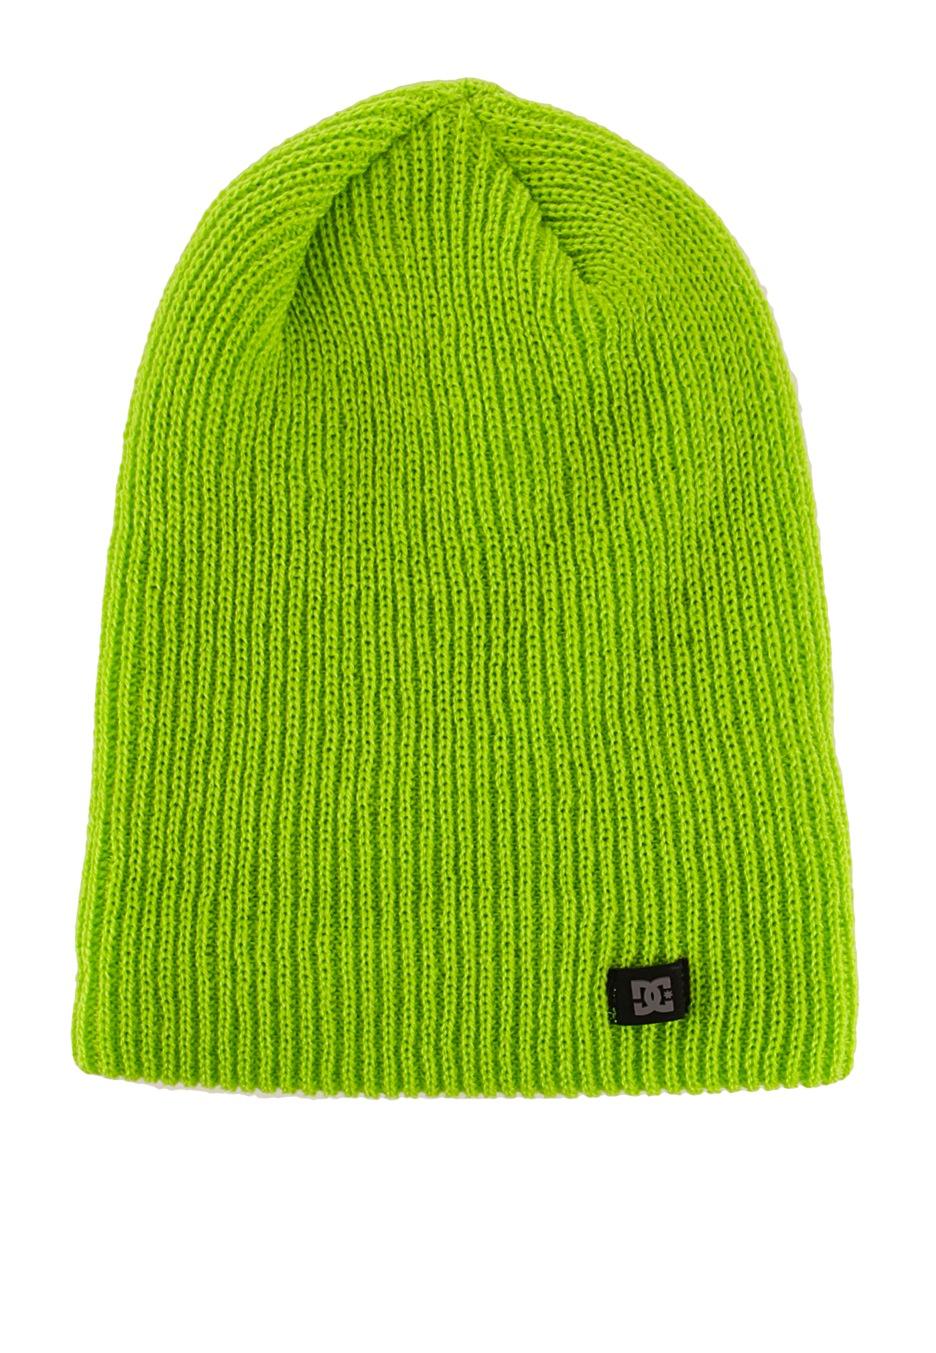 a628032668d24 DC - Yepito 12 Limegreen - Beanie - Streetwear Shop - Impericon.com UK